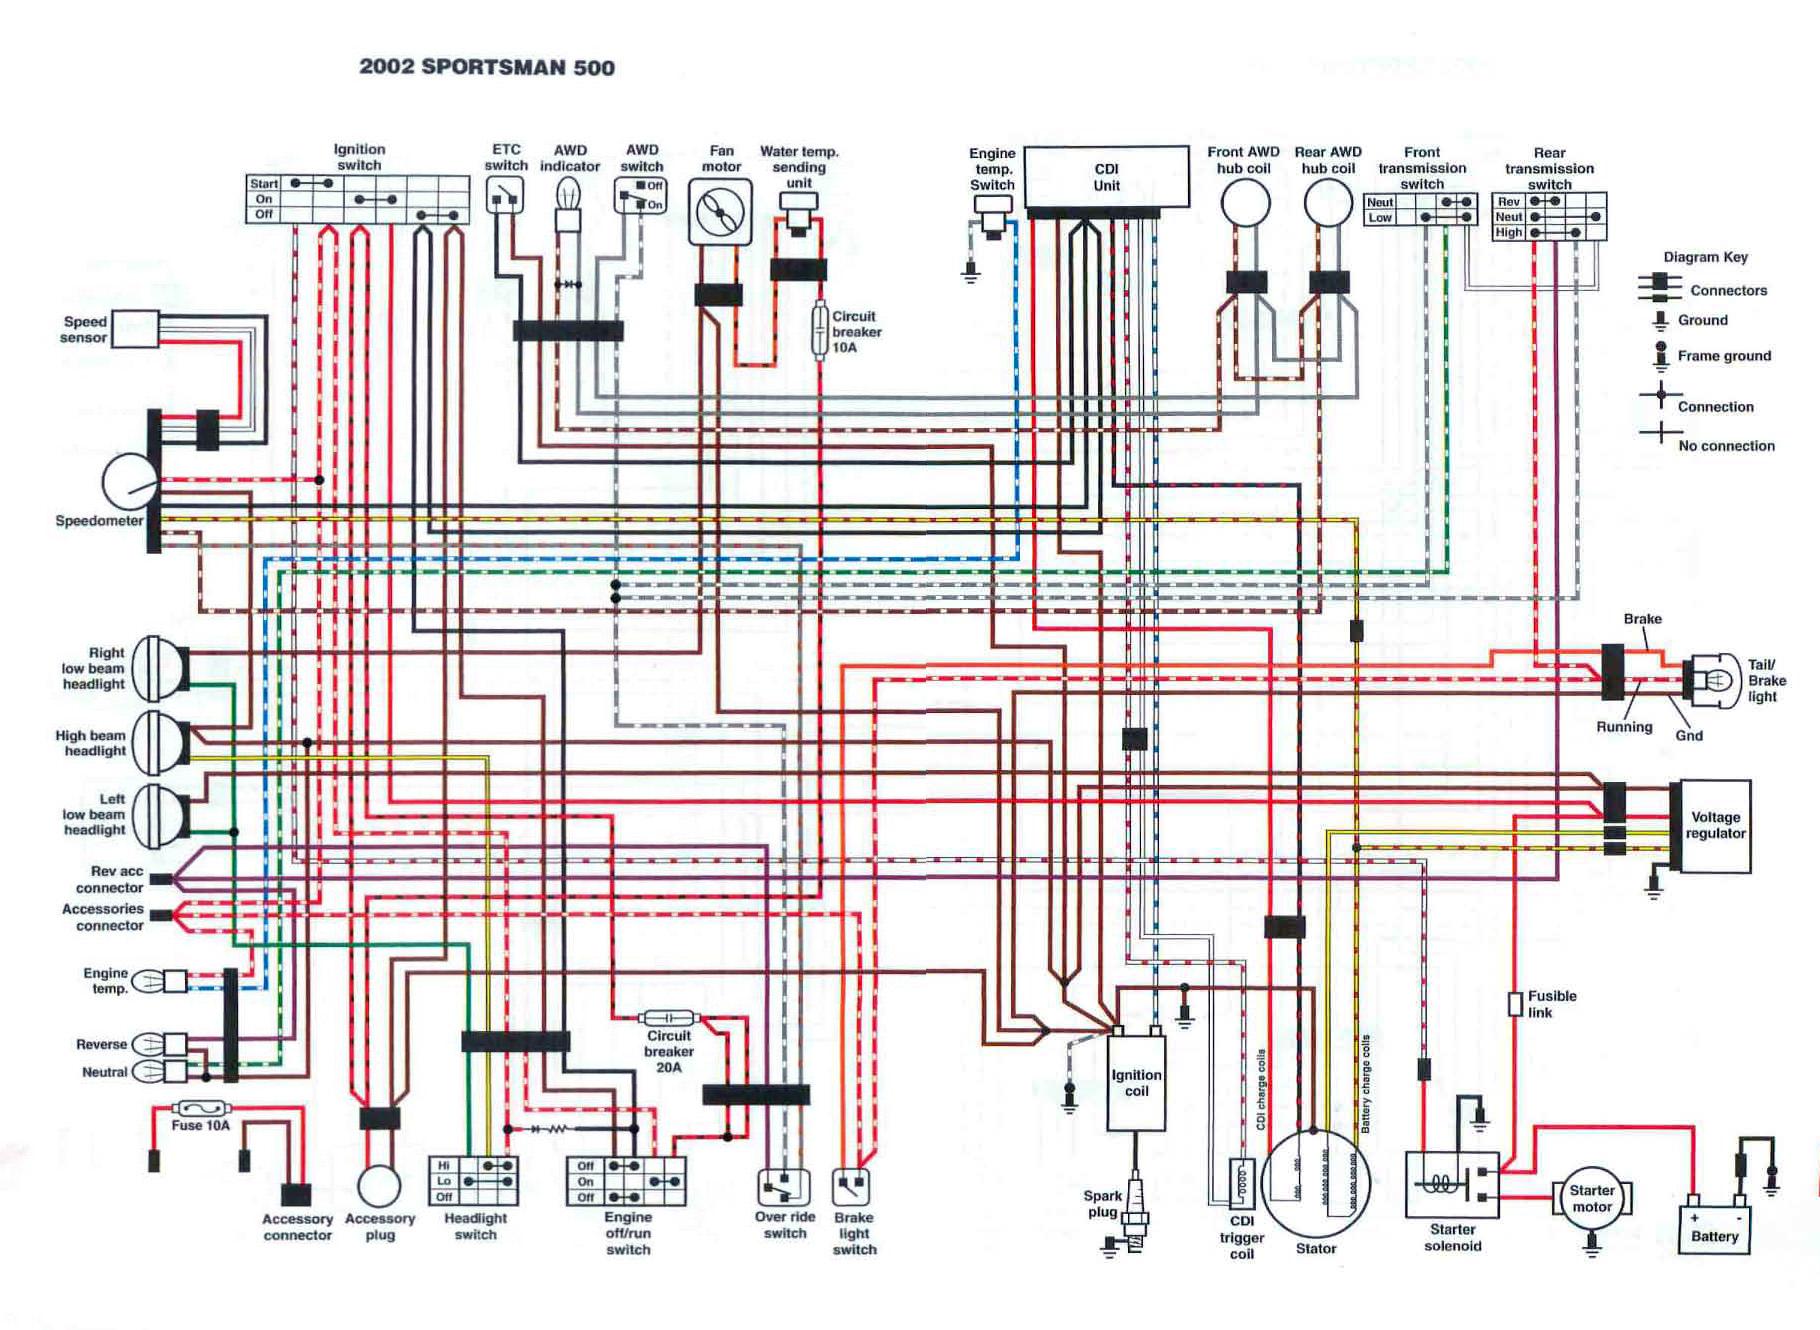 Stunning Cdi Circuit 2001 Polaris Sportsman 500 Ideas - Electrical ...